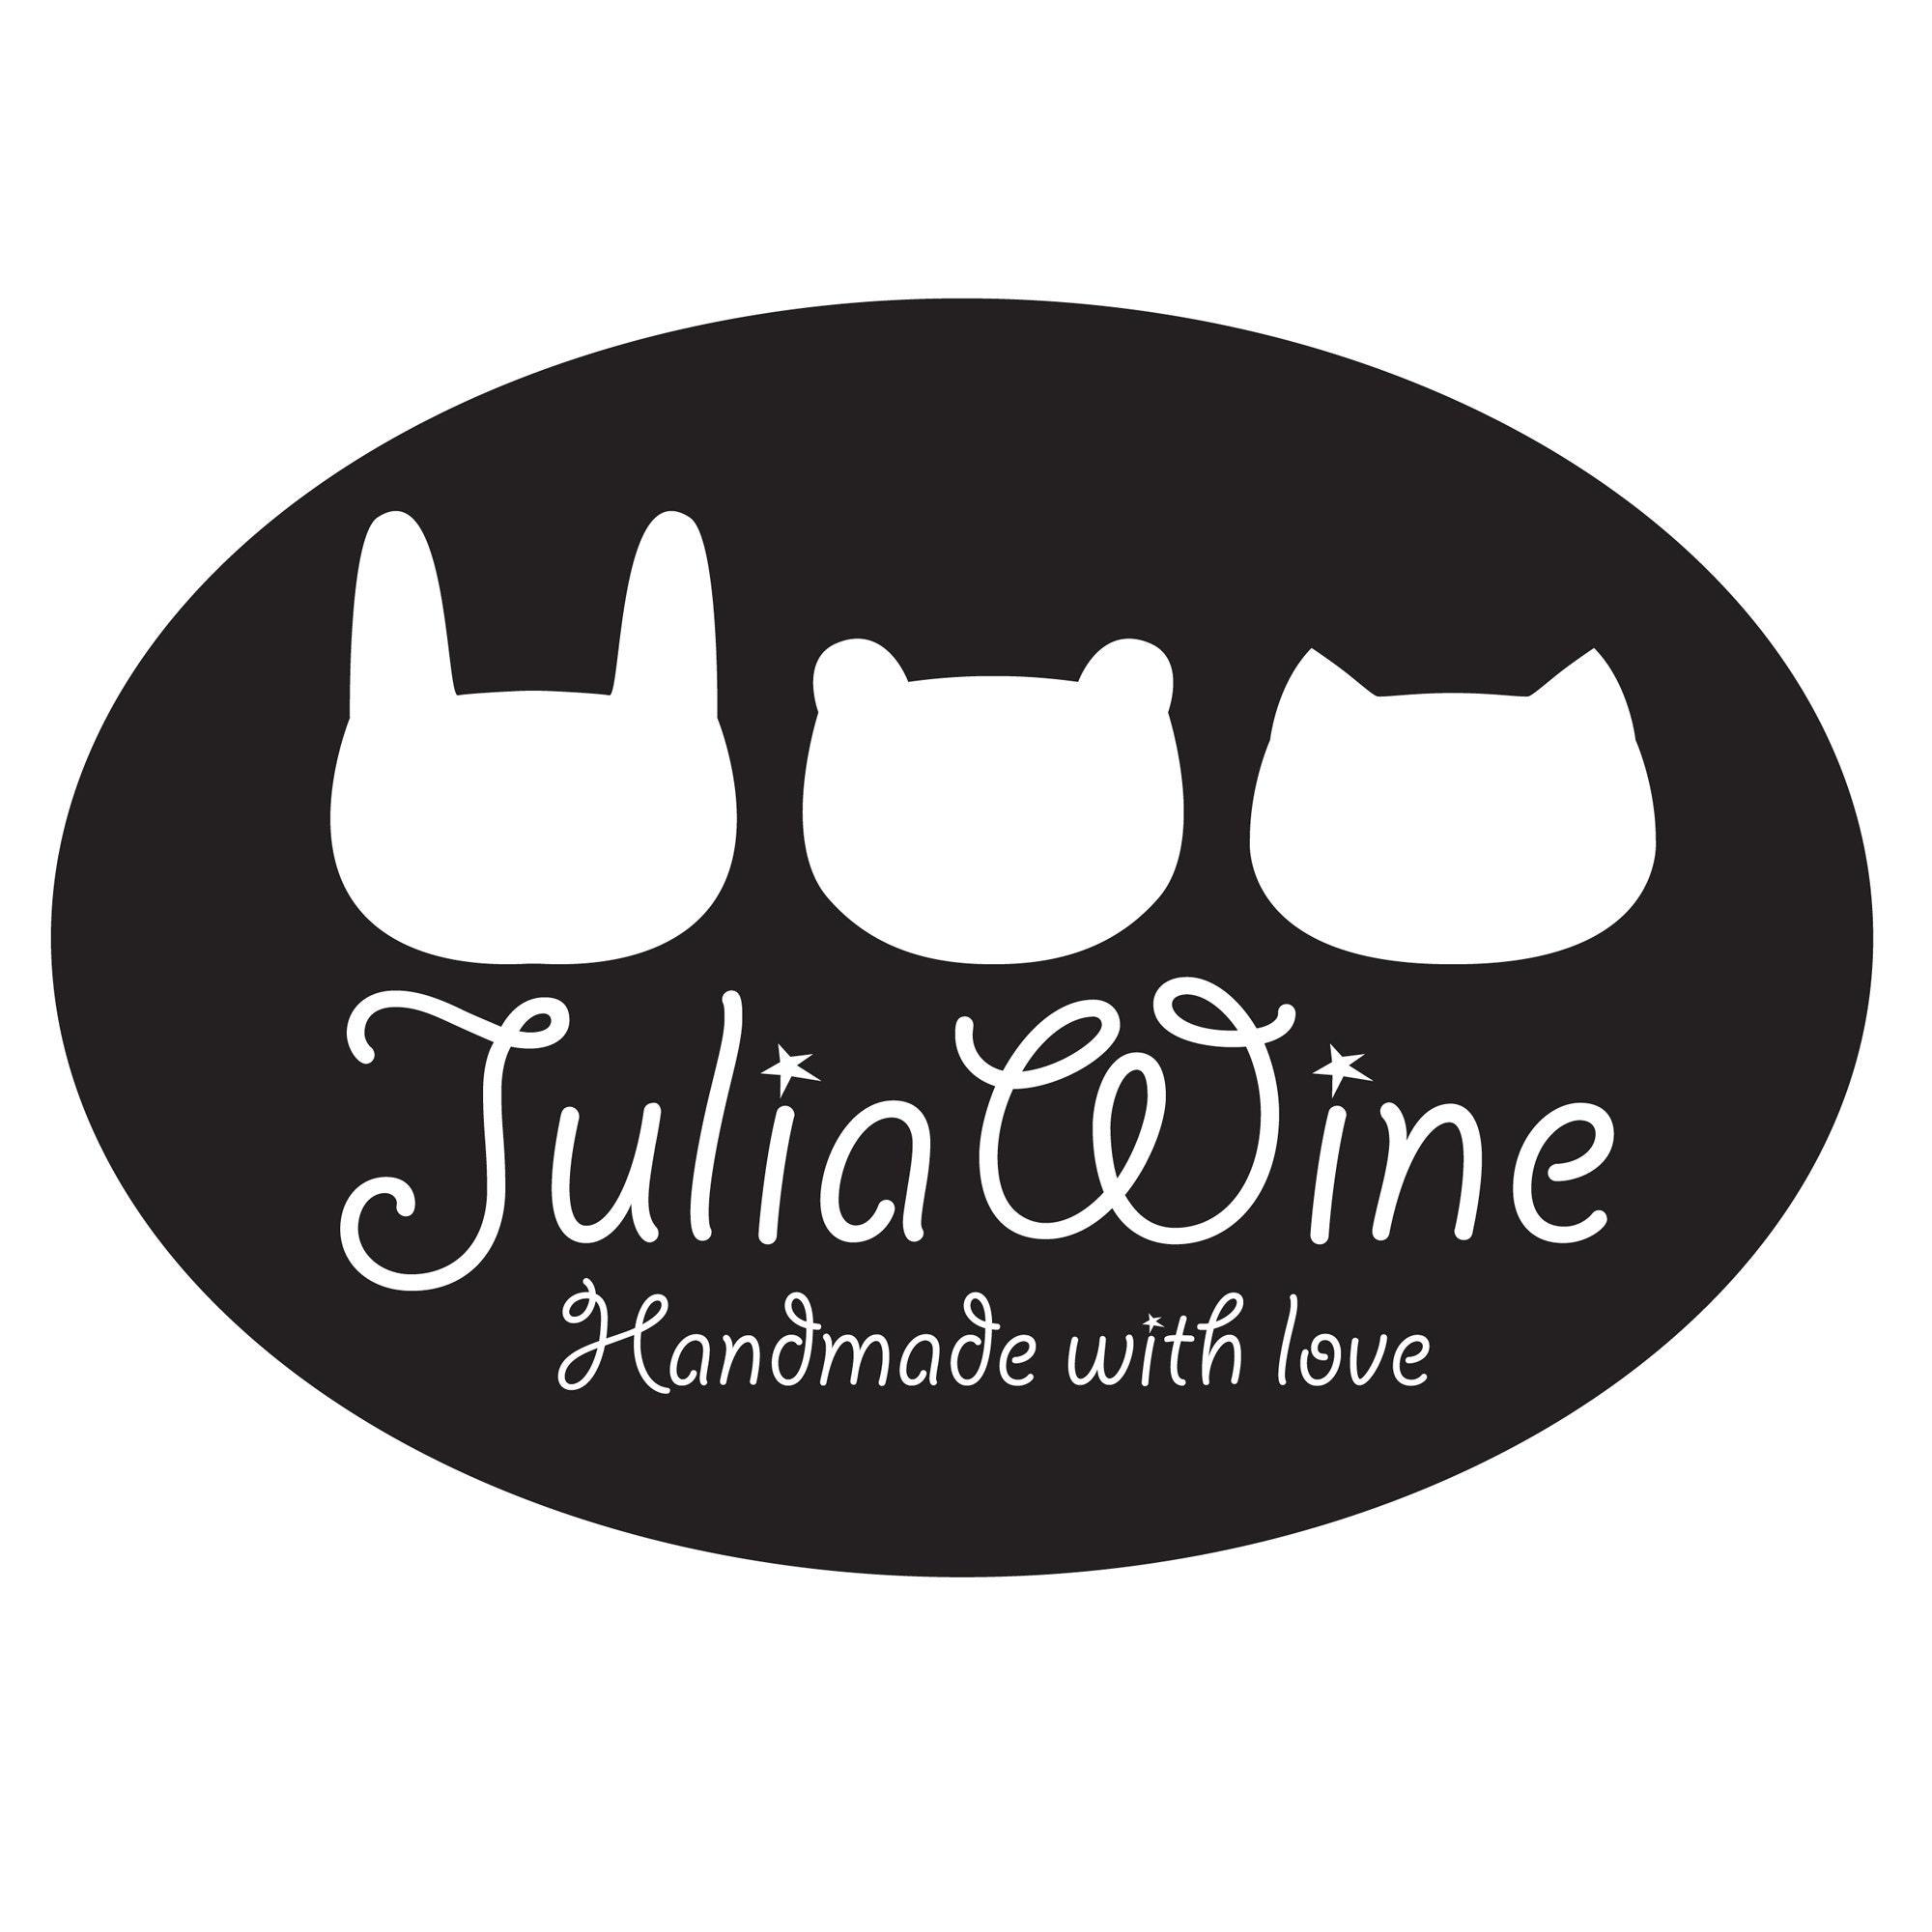 JuliaWine